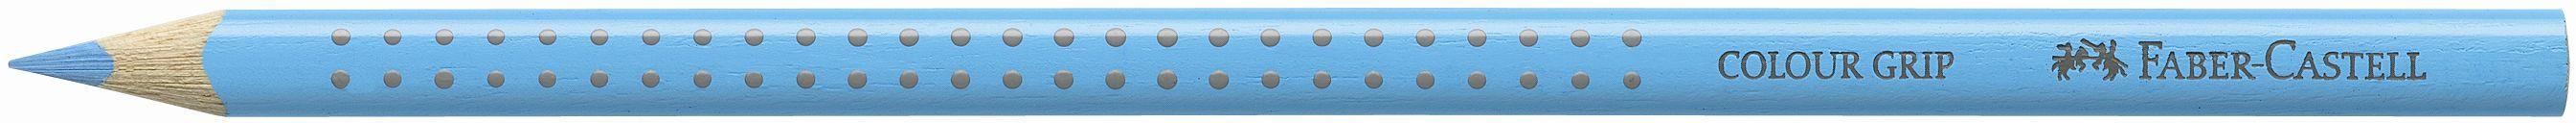 Pastelka Color Grip / 247 tónovaná modravá Faber Castell - Akvarelové pastelky Faber Castell - Akvarelové pastelky